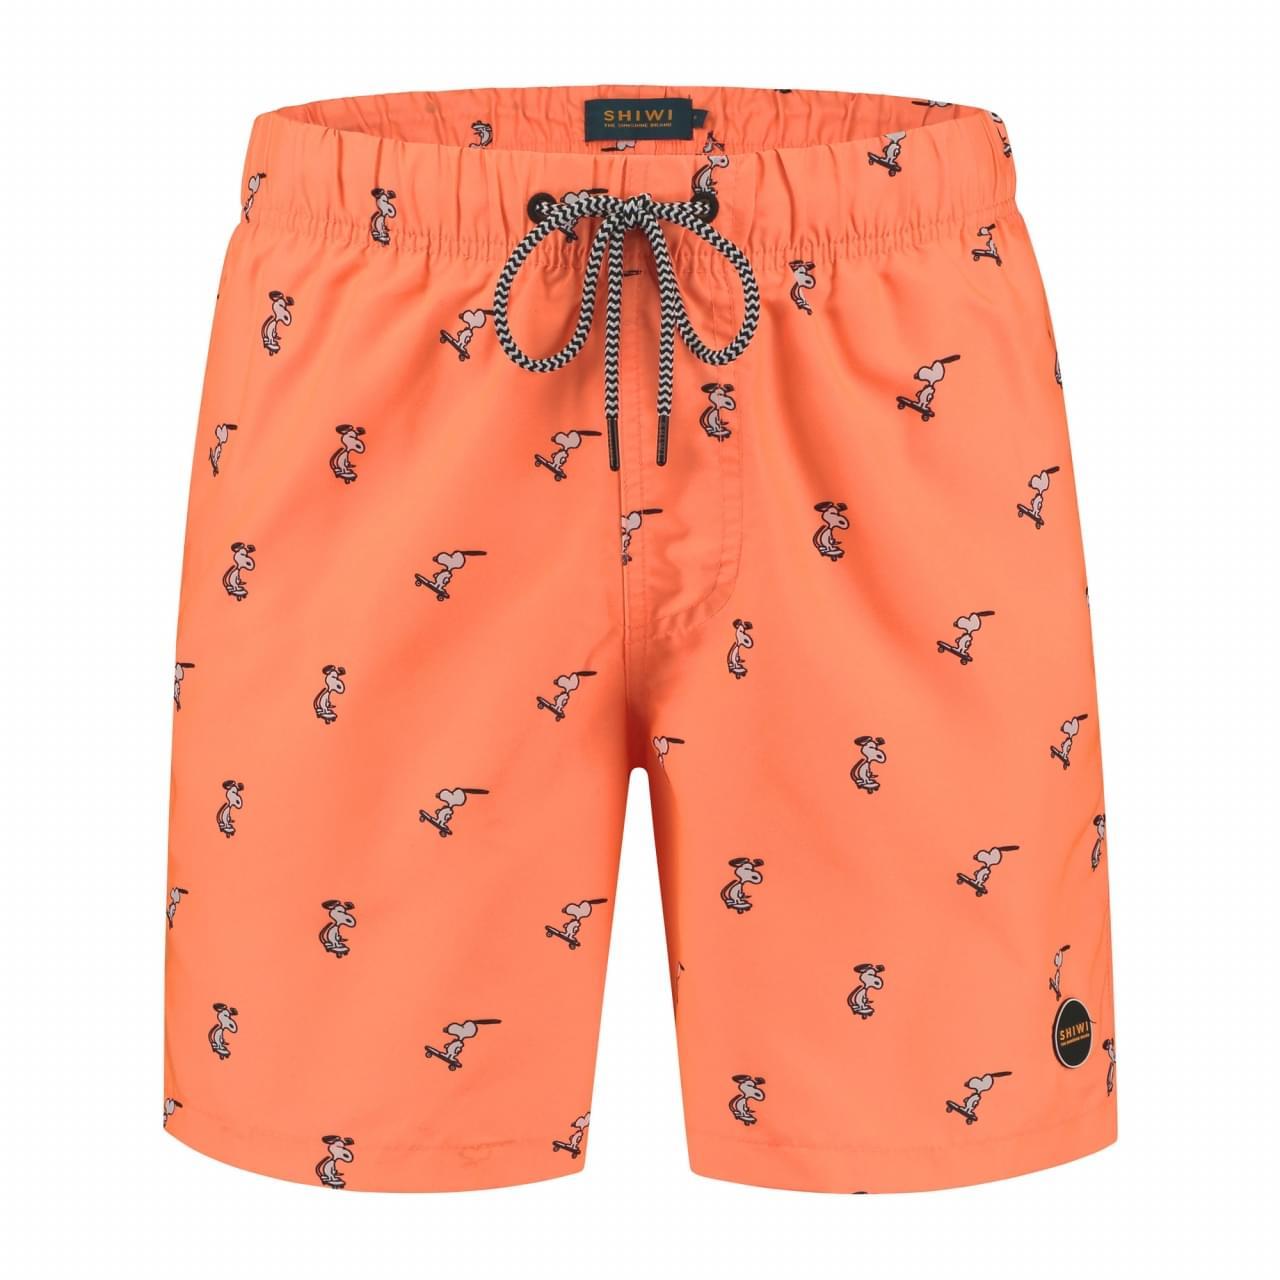 SHIWI Snoopy Happy Skater Zwembroek Heren Oranje